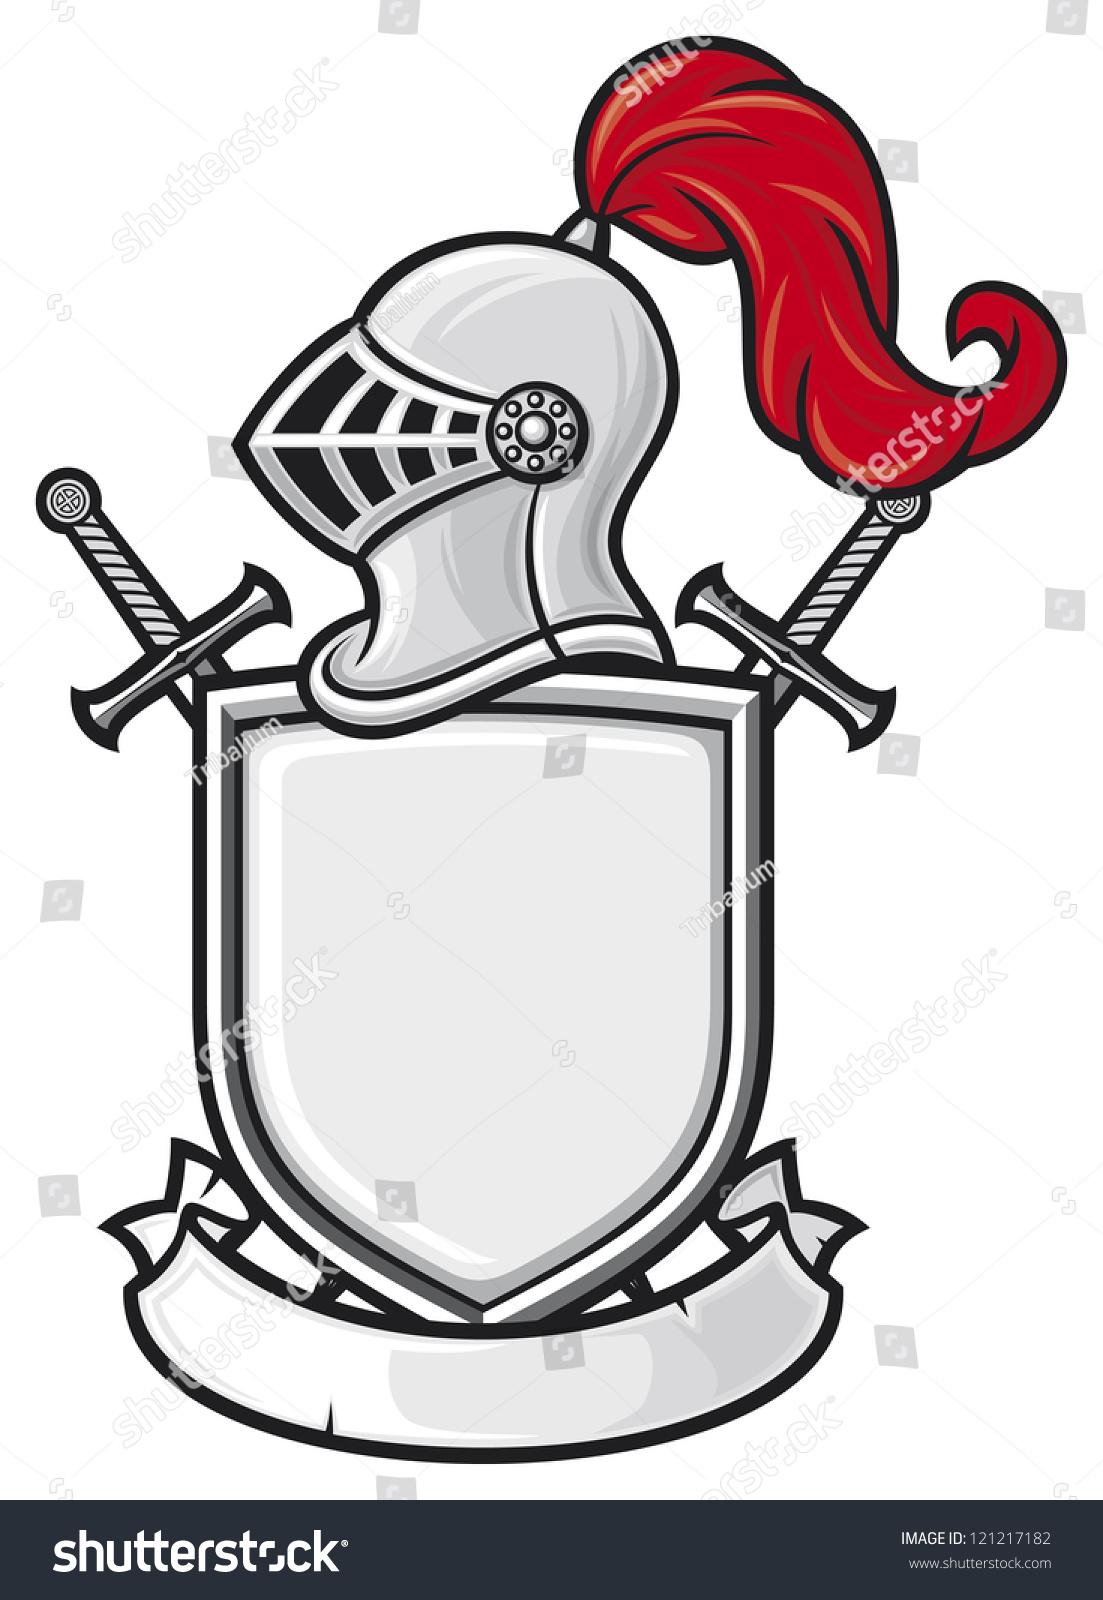 medieval knight helmet shield crossed swords stock